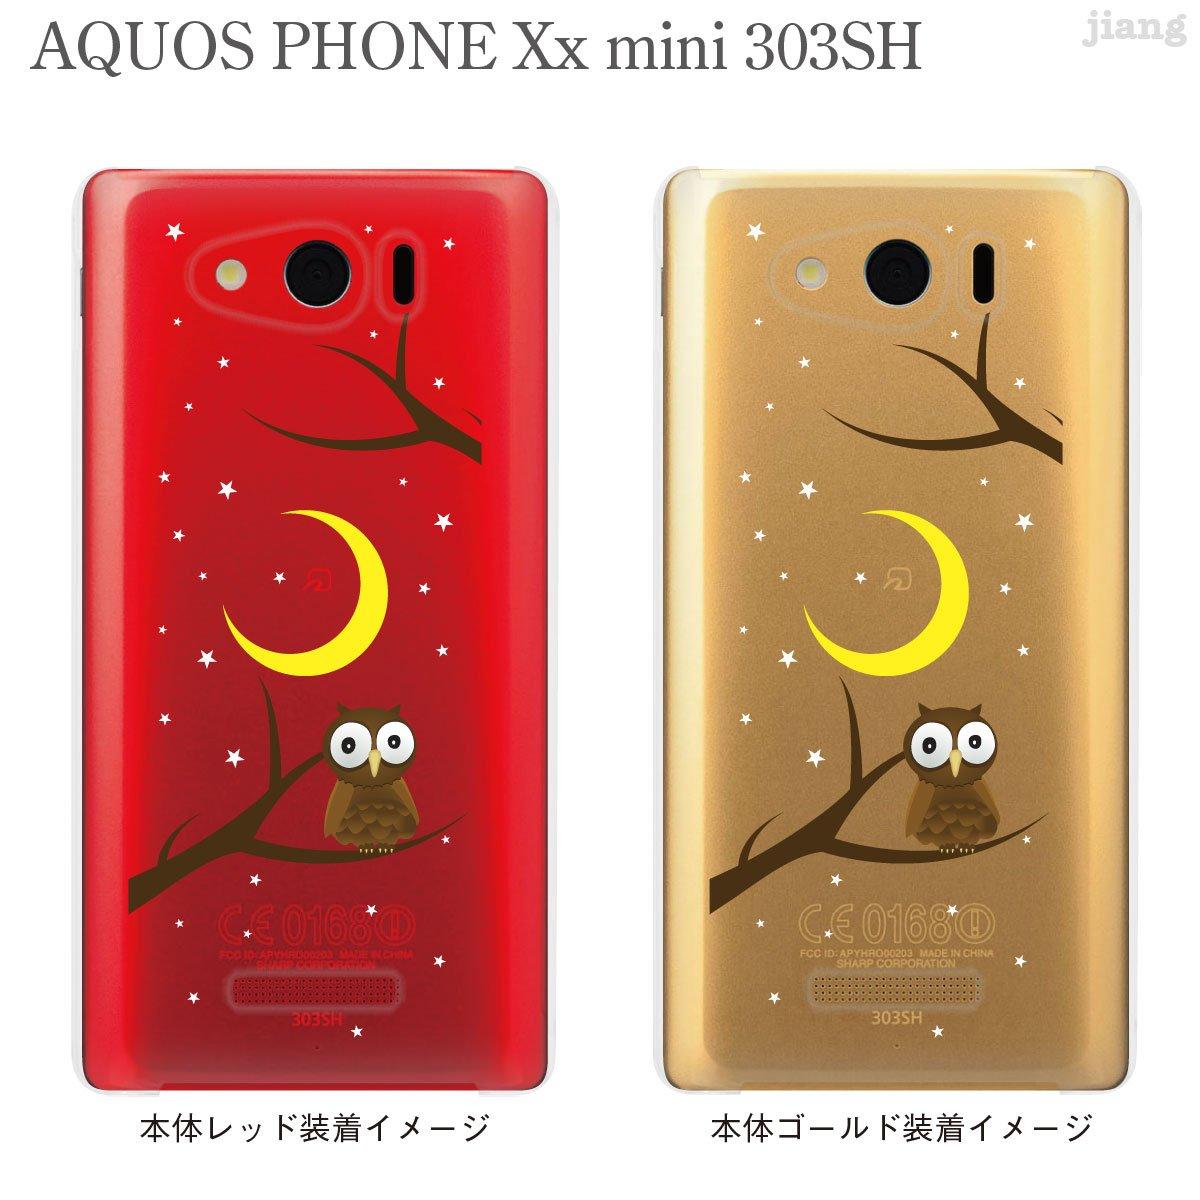 Amazon Jiang Aquos Phone Xx Mini 303sh Softbank Sharp Clear Arts 09 Th0002